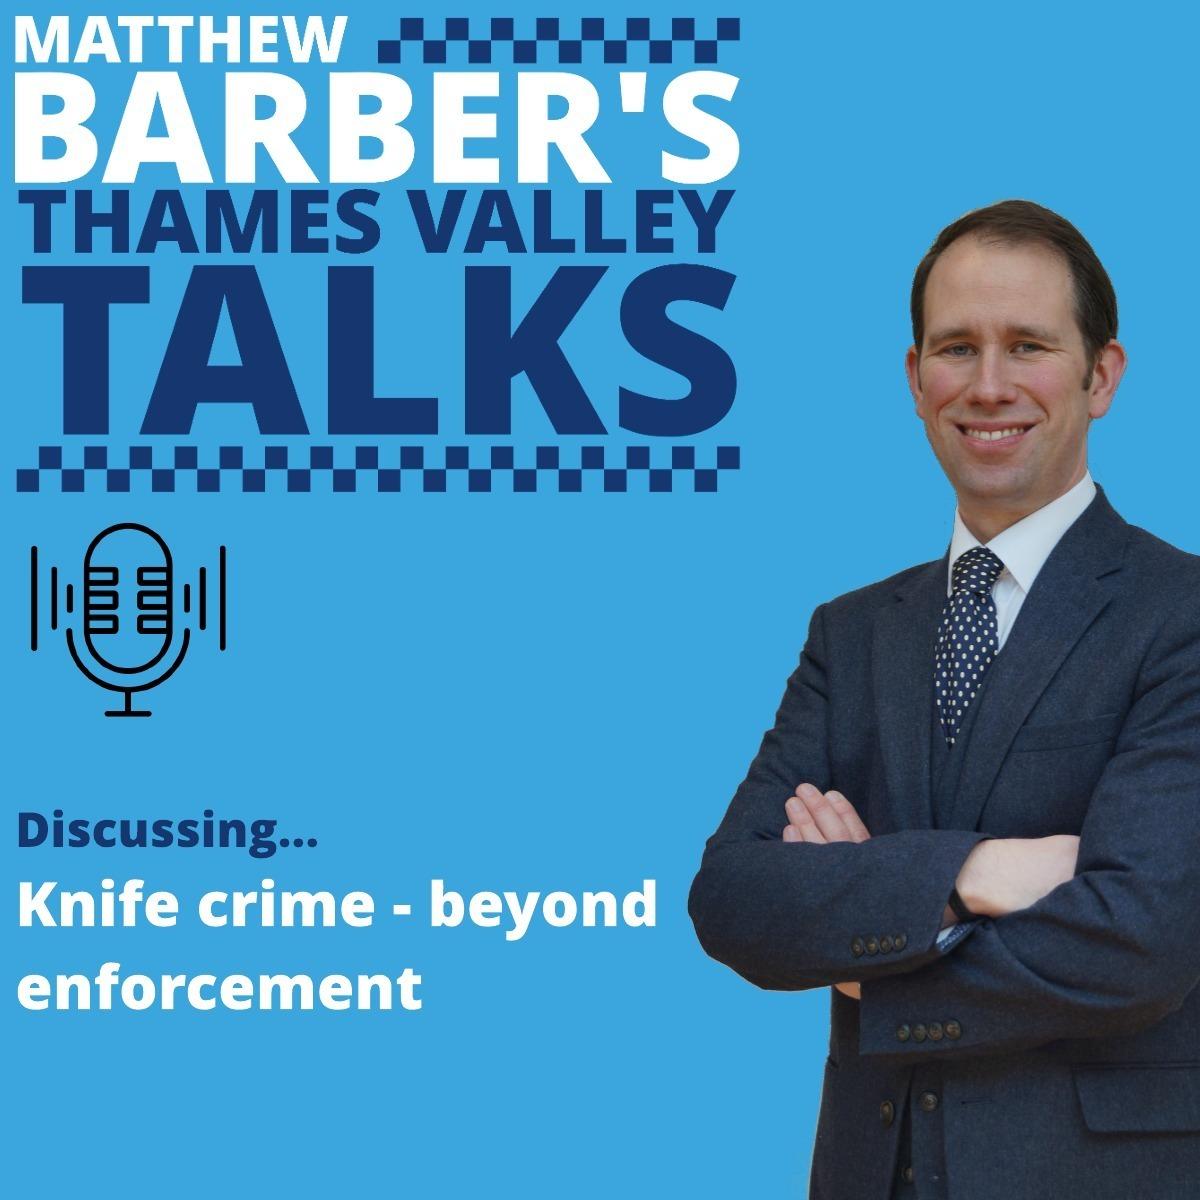 Knife crime - going beyond enforcment